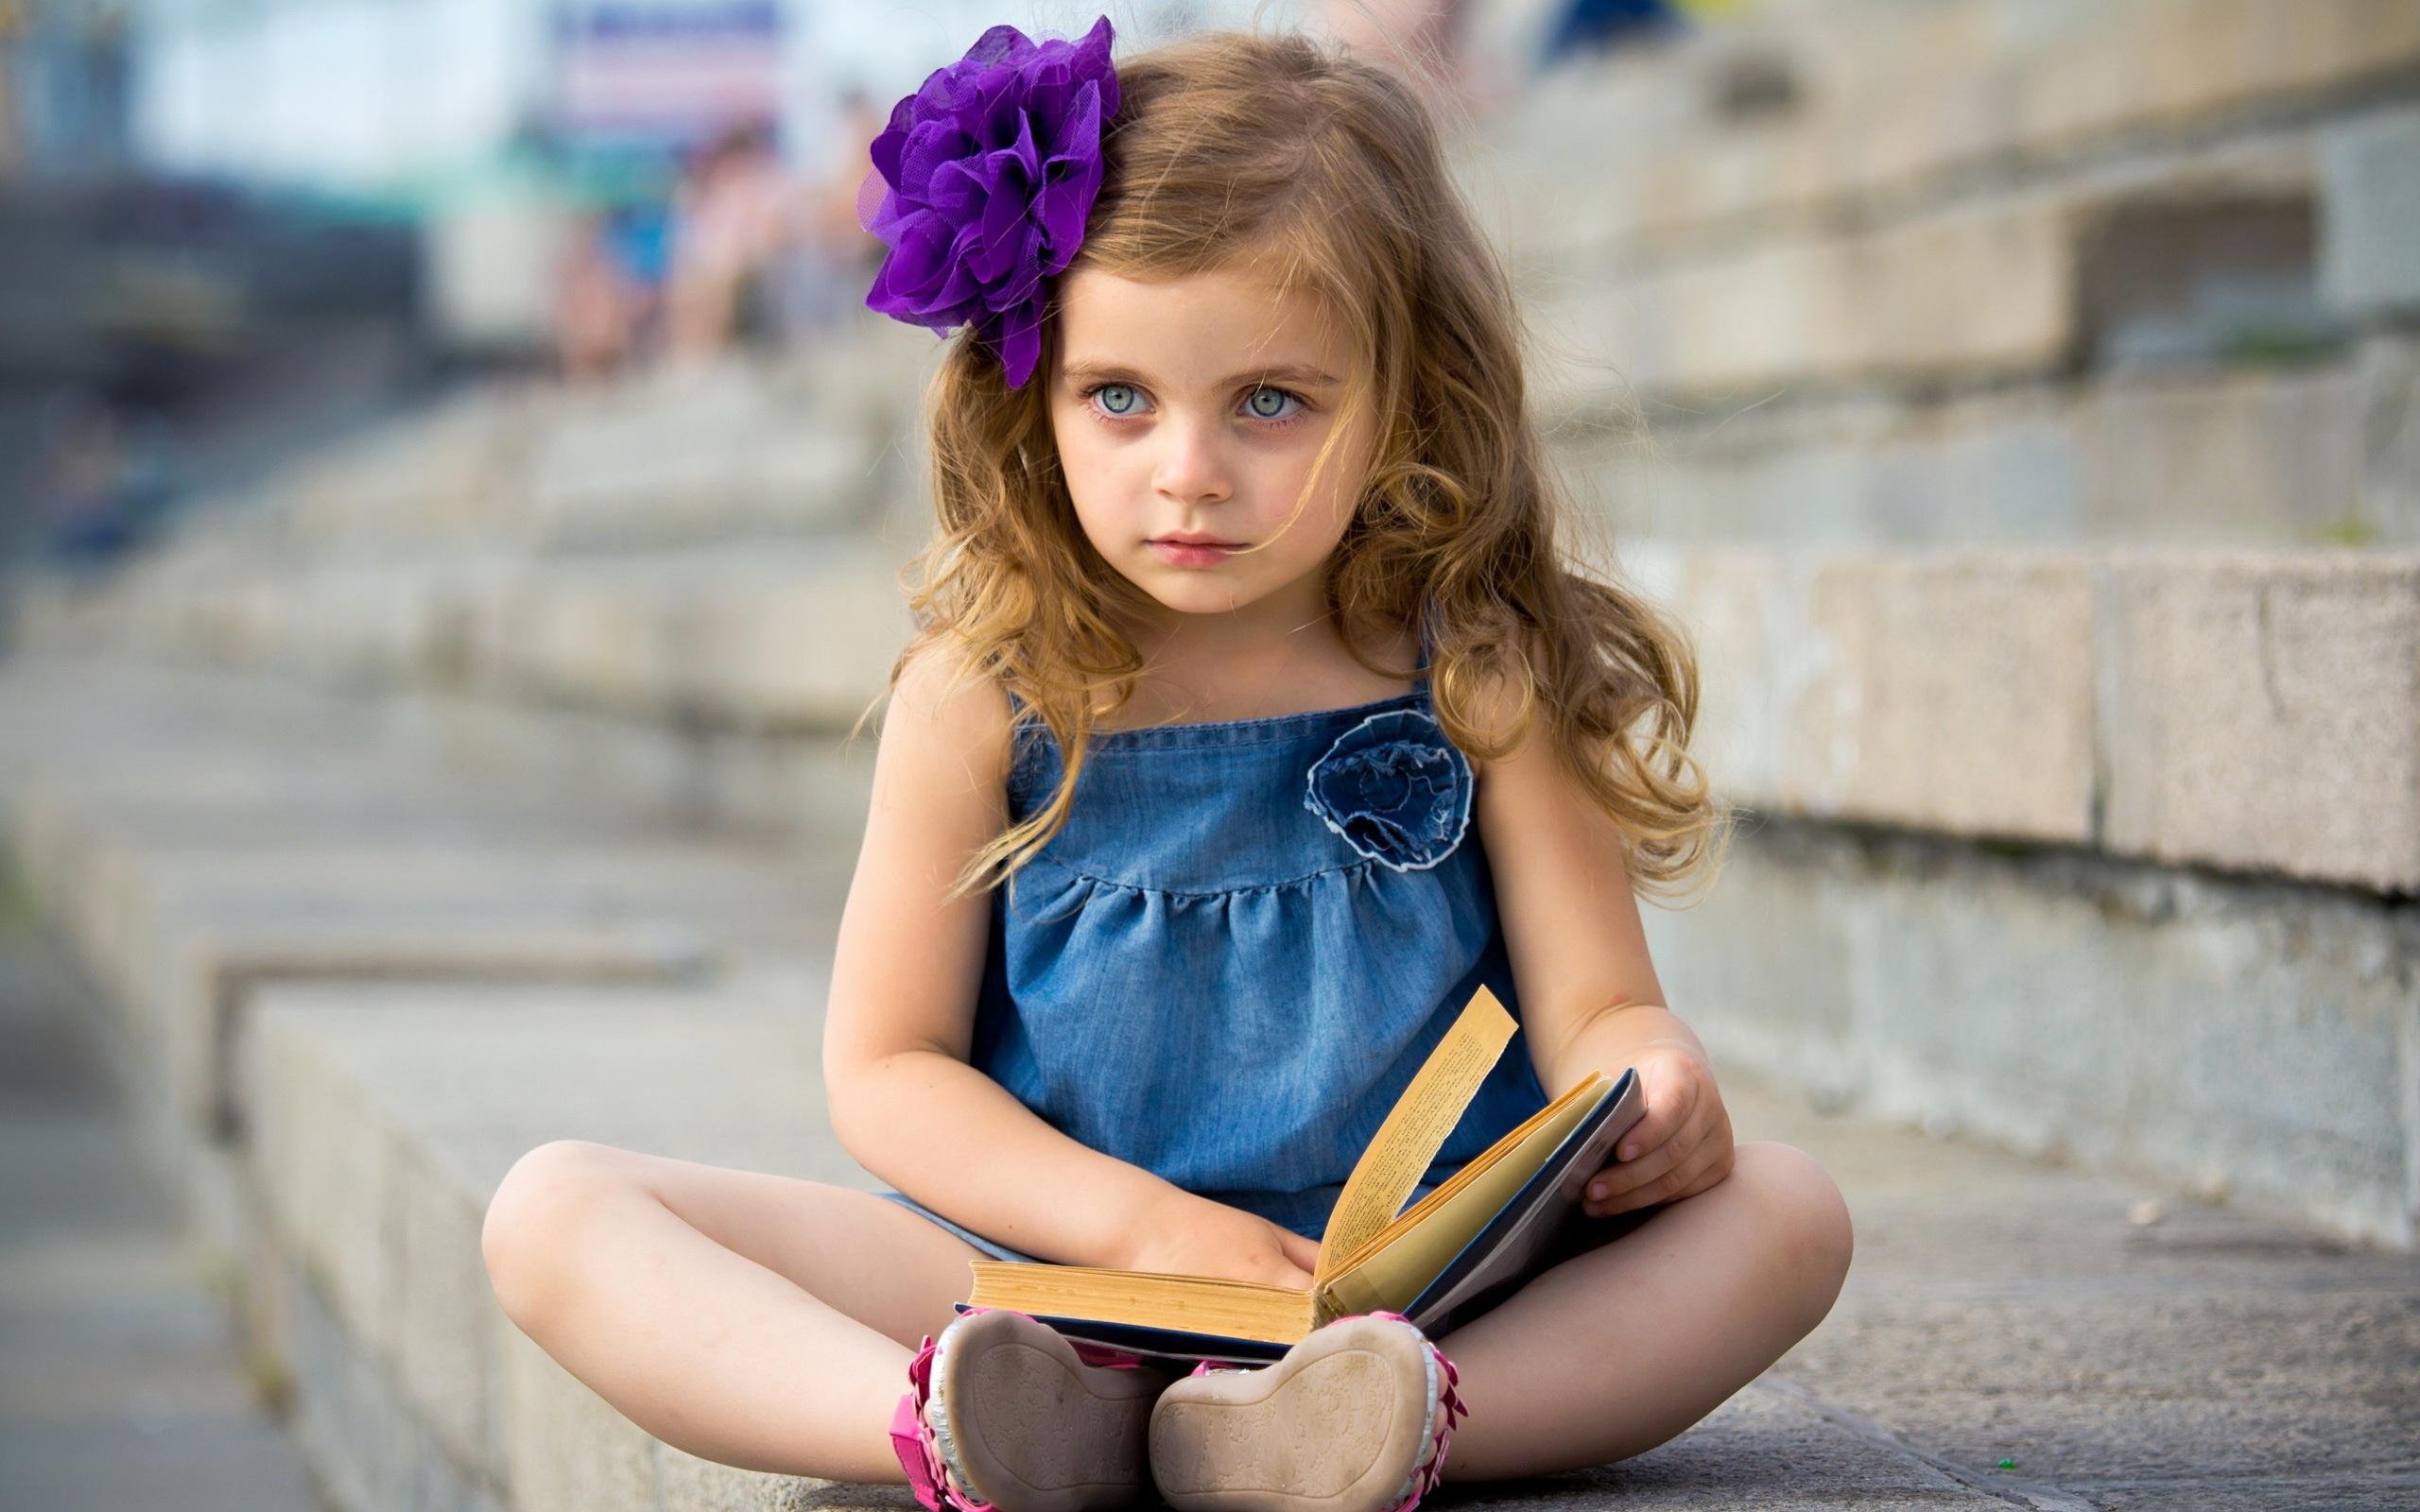 Wallpaper cute little girl reading a book 2560x1600 hd - Cute little girl pic hd ...